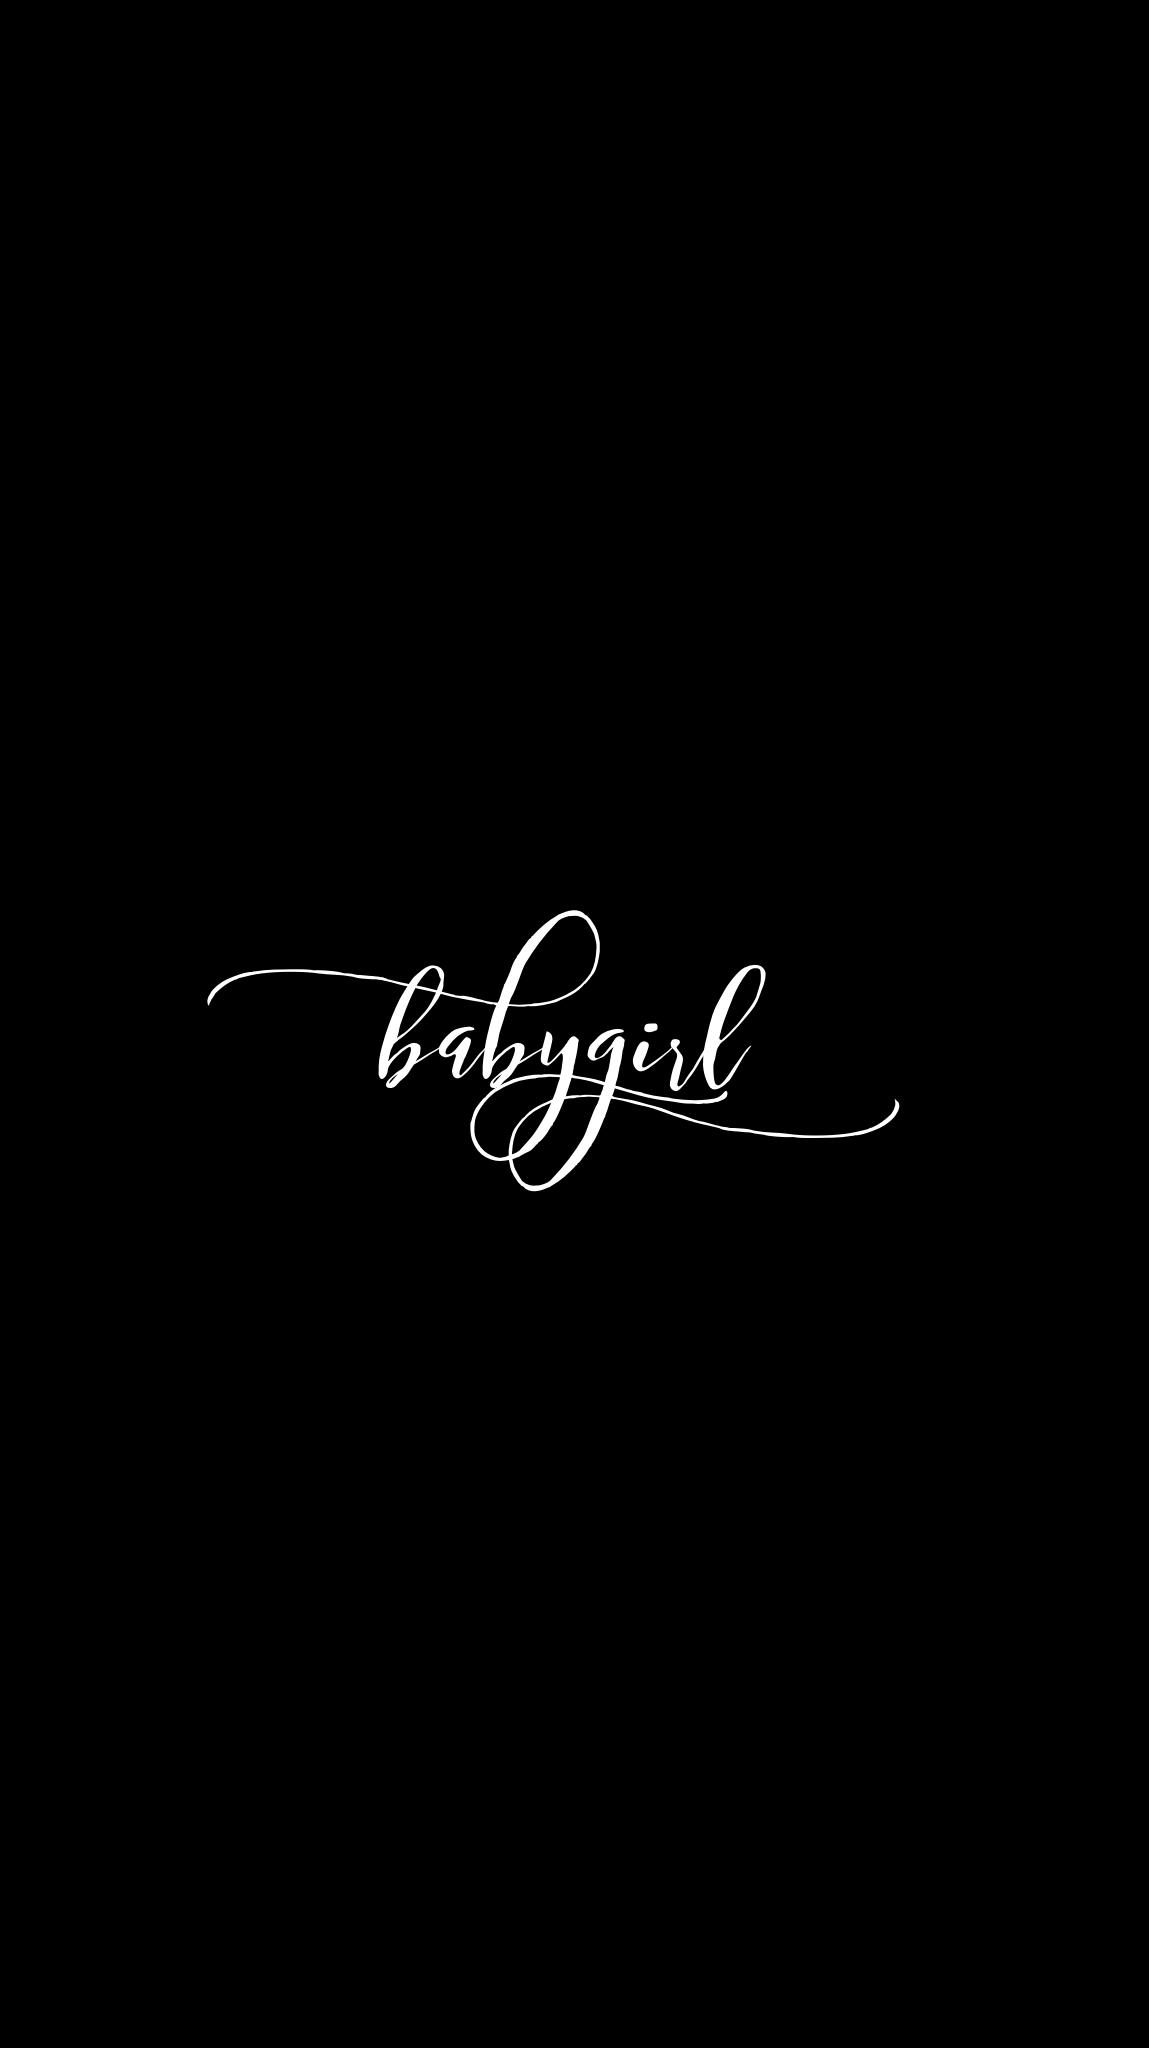 BlckBabygirlCalligraphy Edit Mobile Wallpaper EvaLand